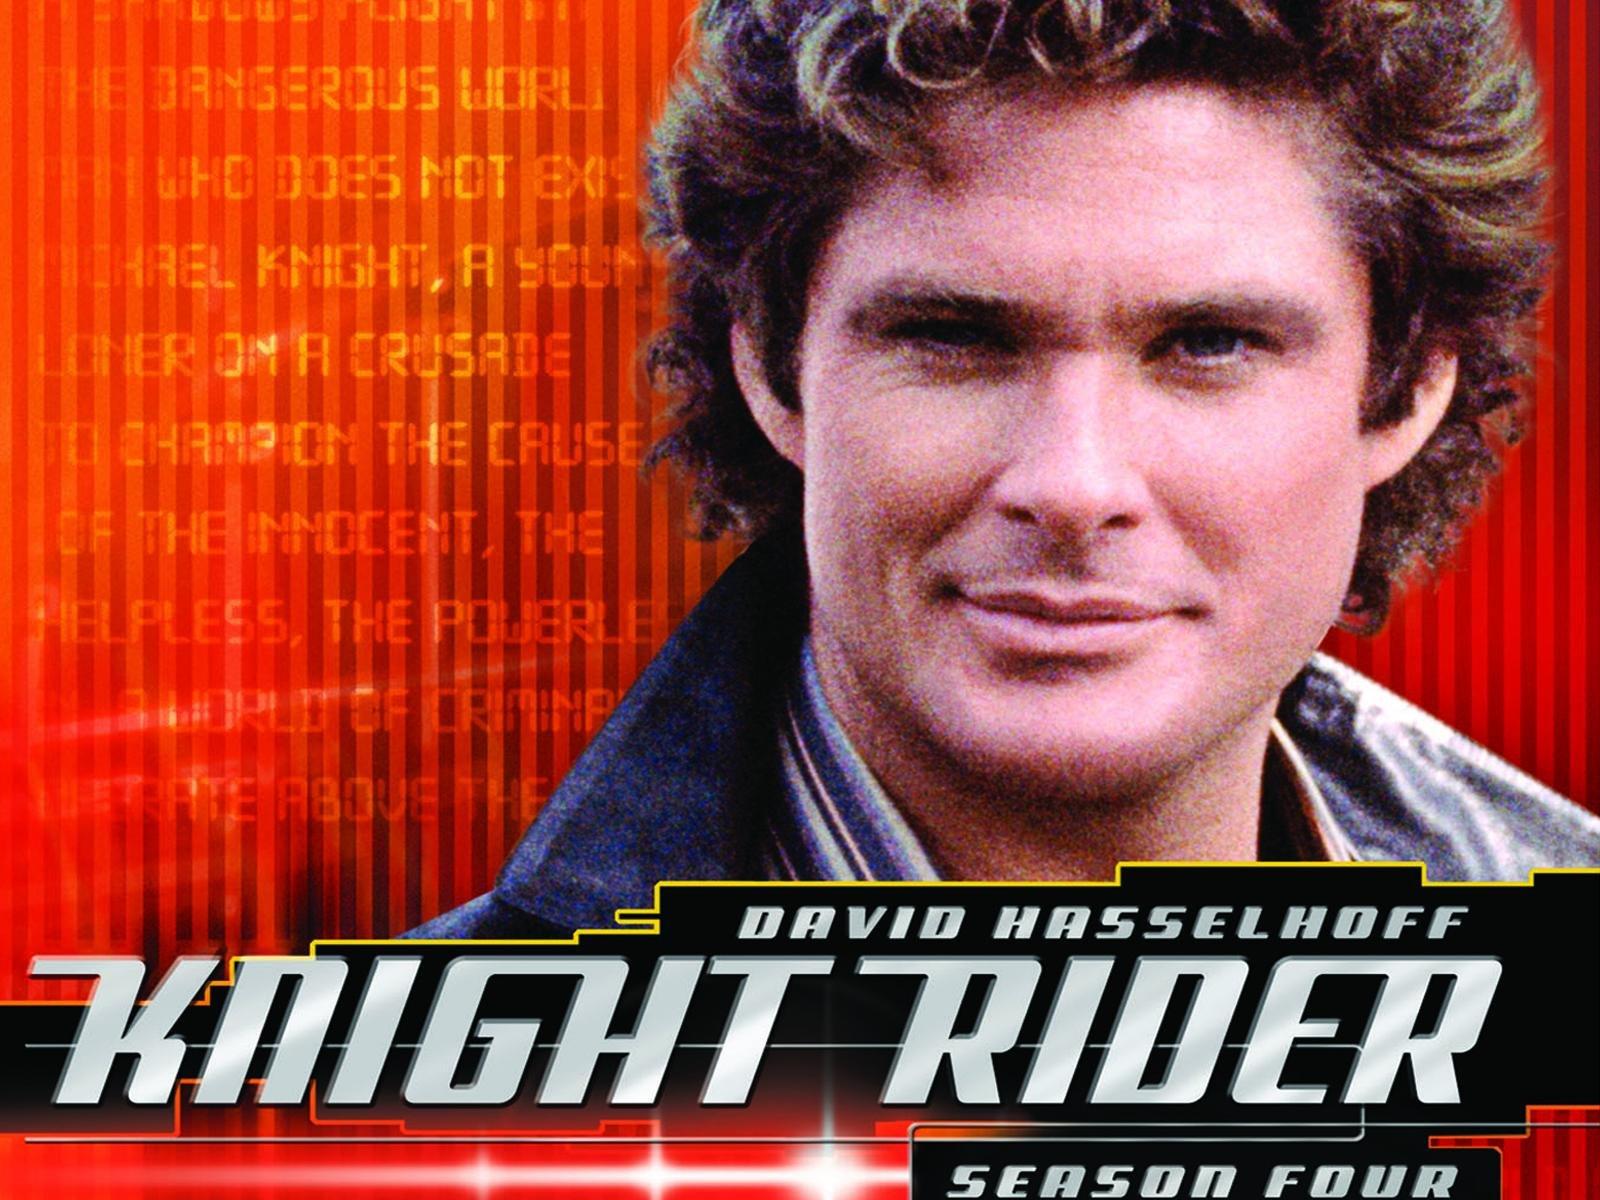 Amazon.com: Knight Rider Classic Season 4: David Hasselhoff, William Daniels, Edward Mulhare, Peter Parros, Patricia McPherson, Peter Cullen, Rebecca Holden ...